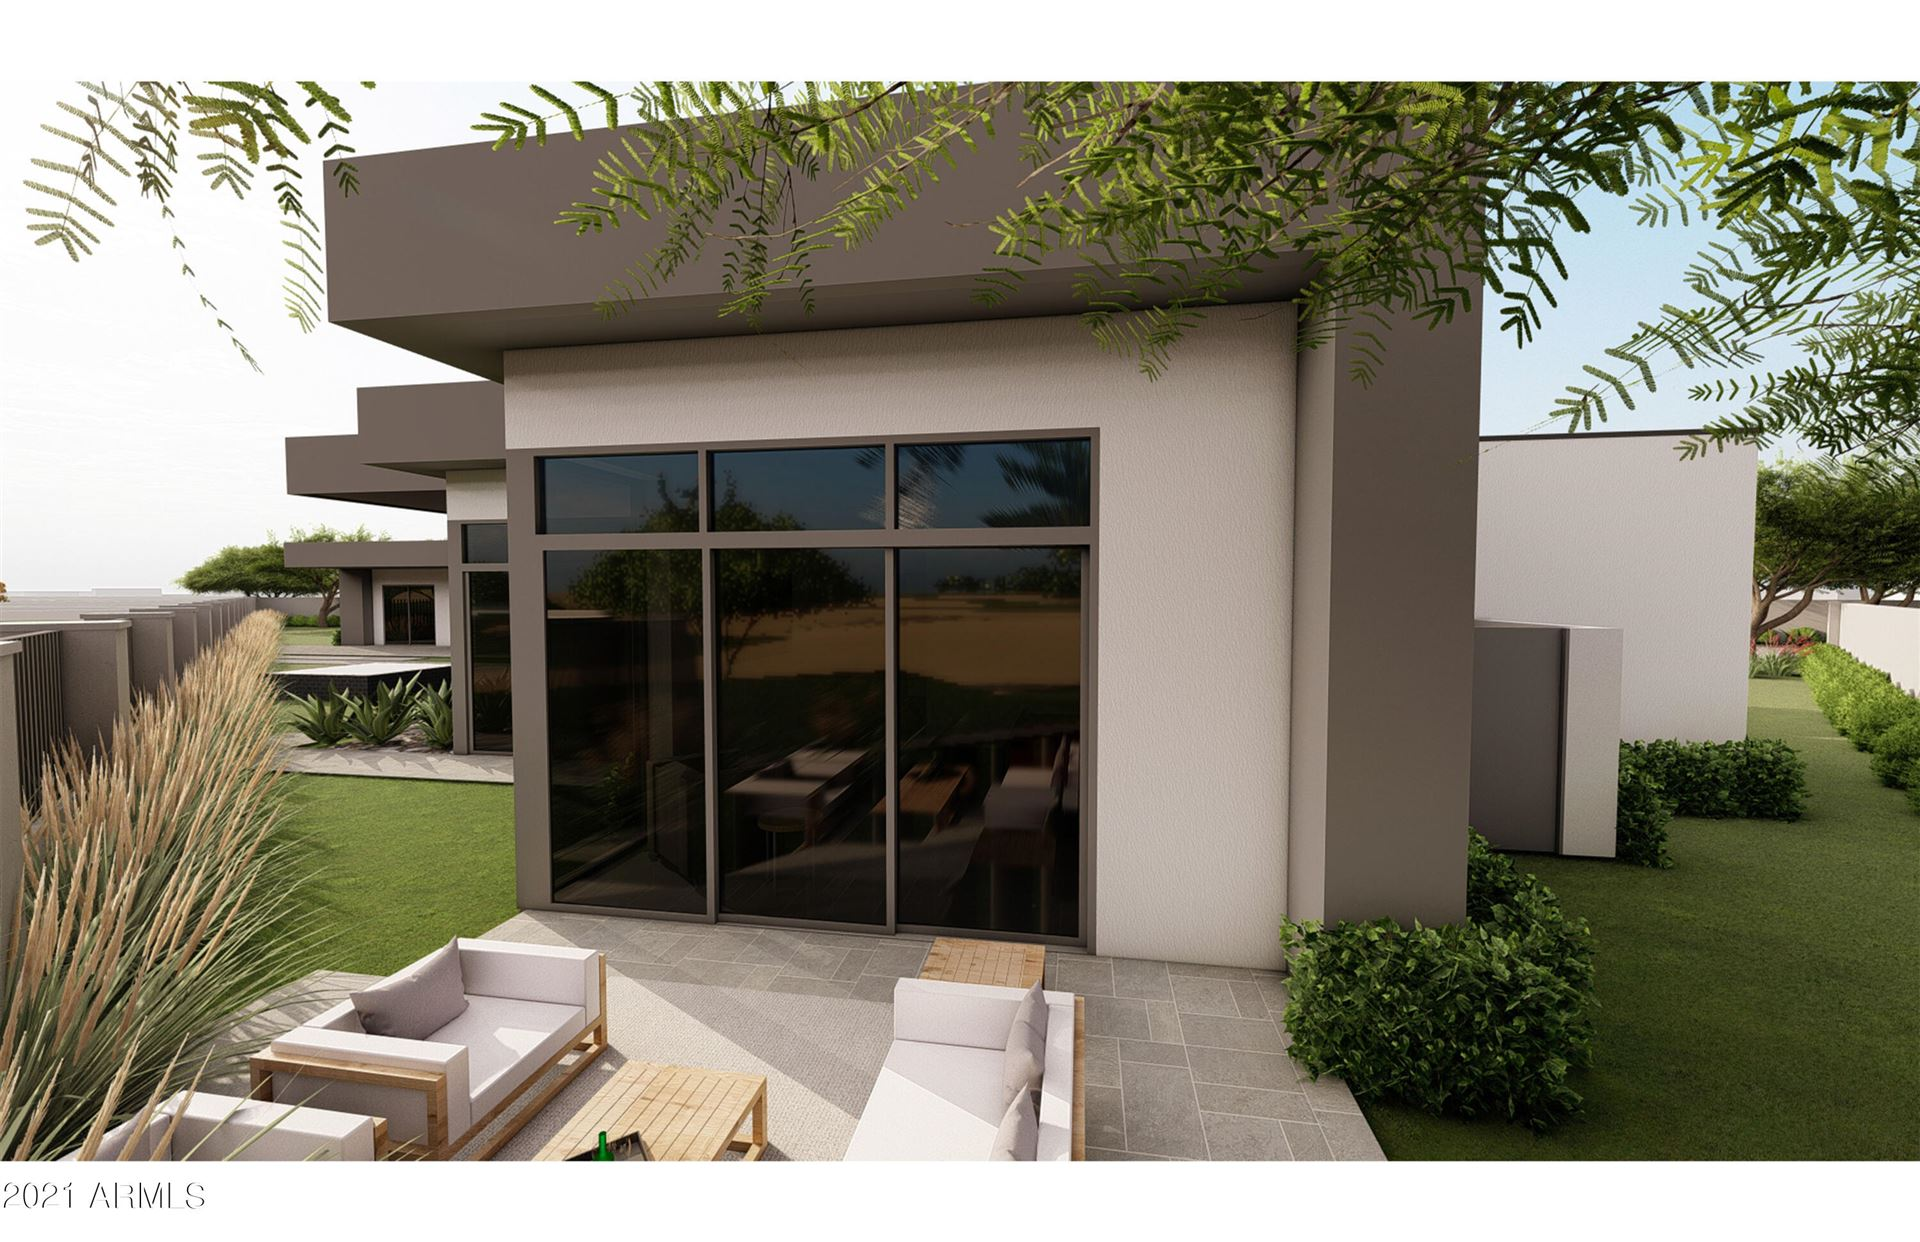 Photo of 7142 E IRONWOOD Drive, Paradise Valley, AZ 85253 (MLS # 6264194)